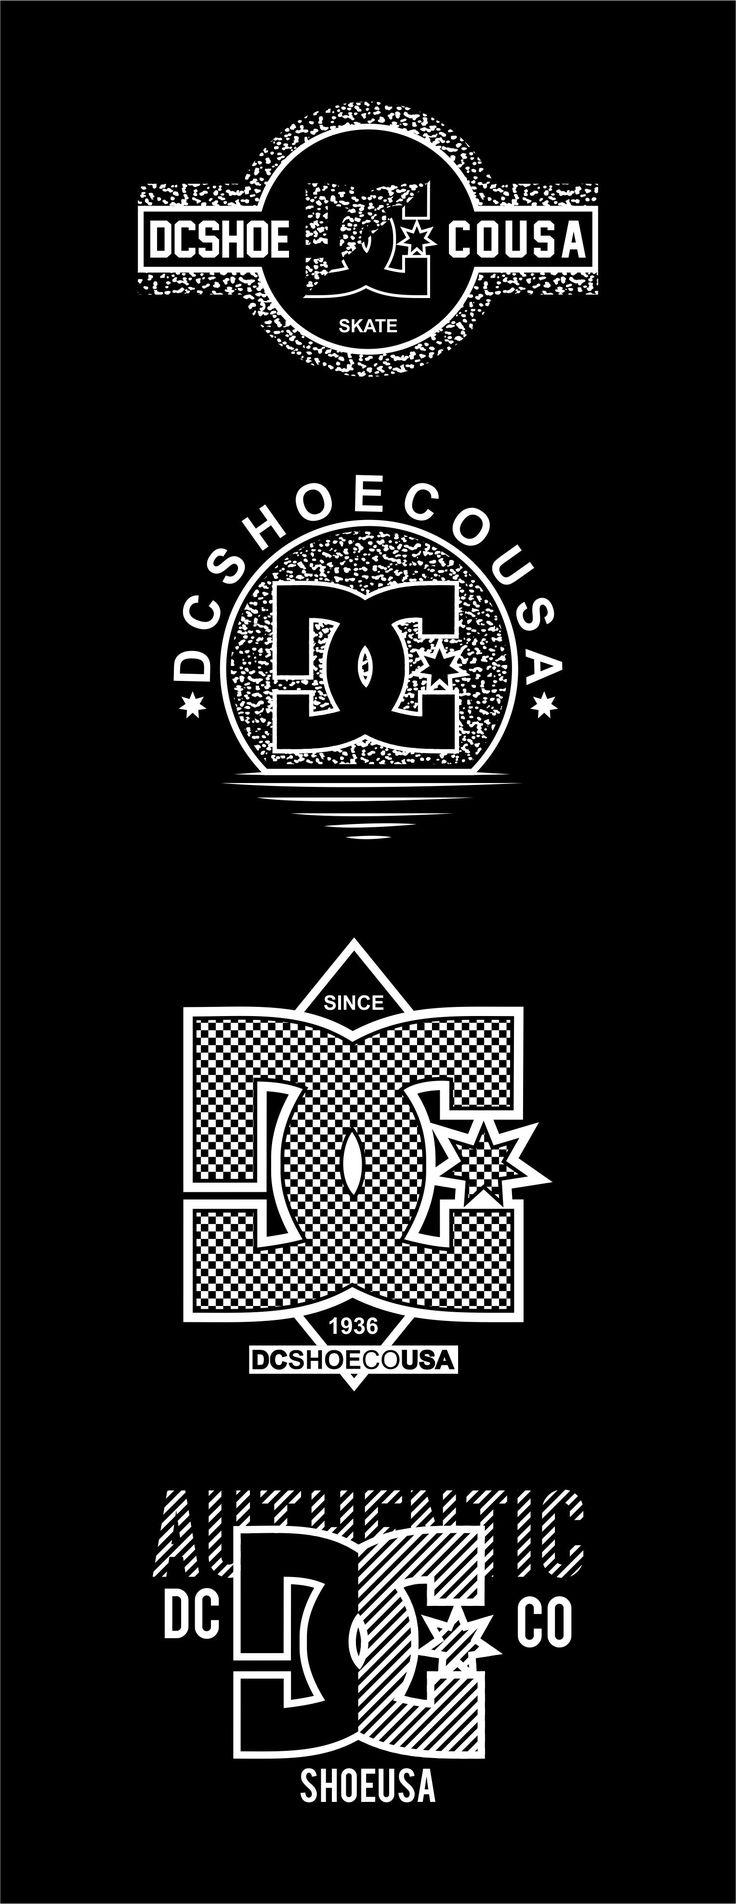 Vintage Vector dc #vintage #vector #vectorsurf #vintagevector #volcom #adidas #billabong #rusty #nike #puma #levis #quiksilver #ripcurl #dc #vans #spyderbilt #reebok